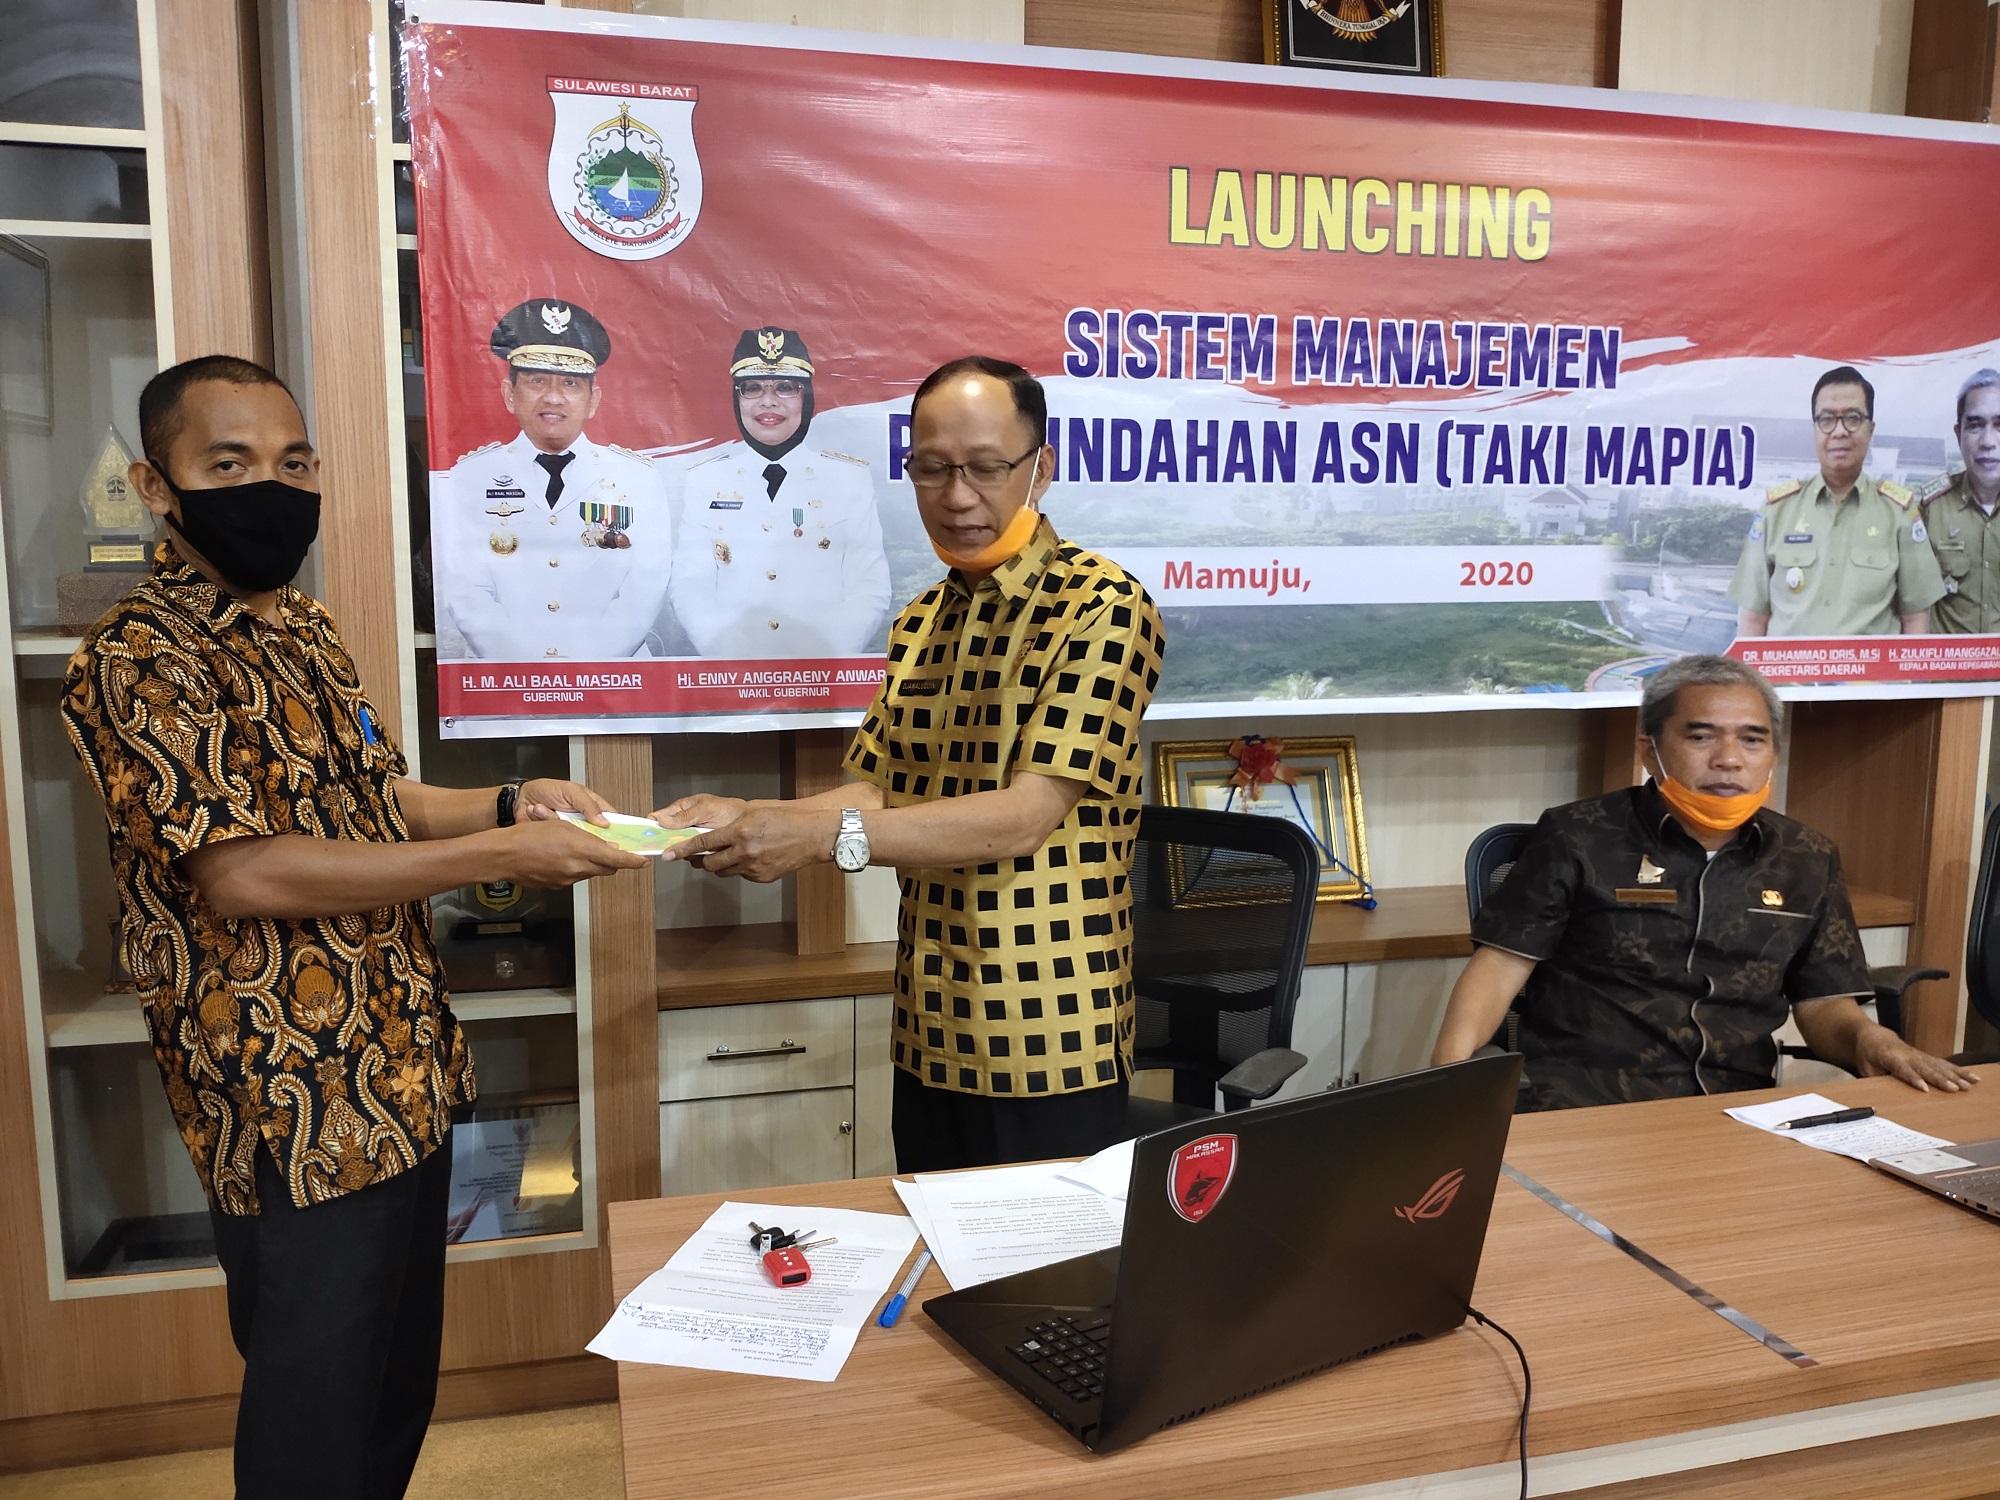 Launching Aplikasi TAKI MAPIA